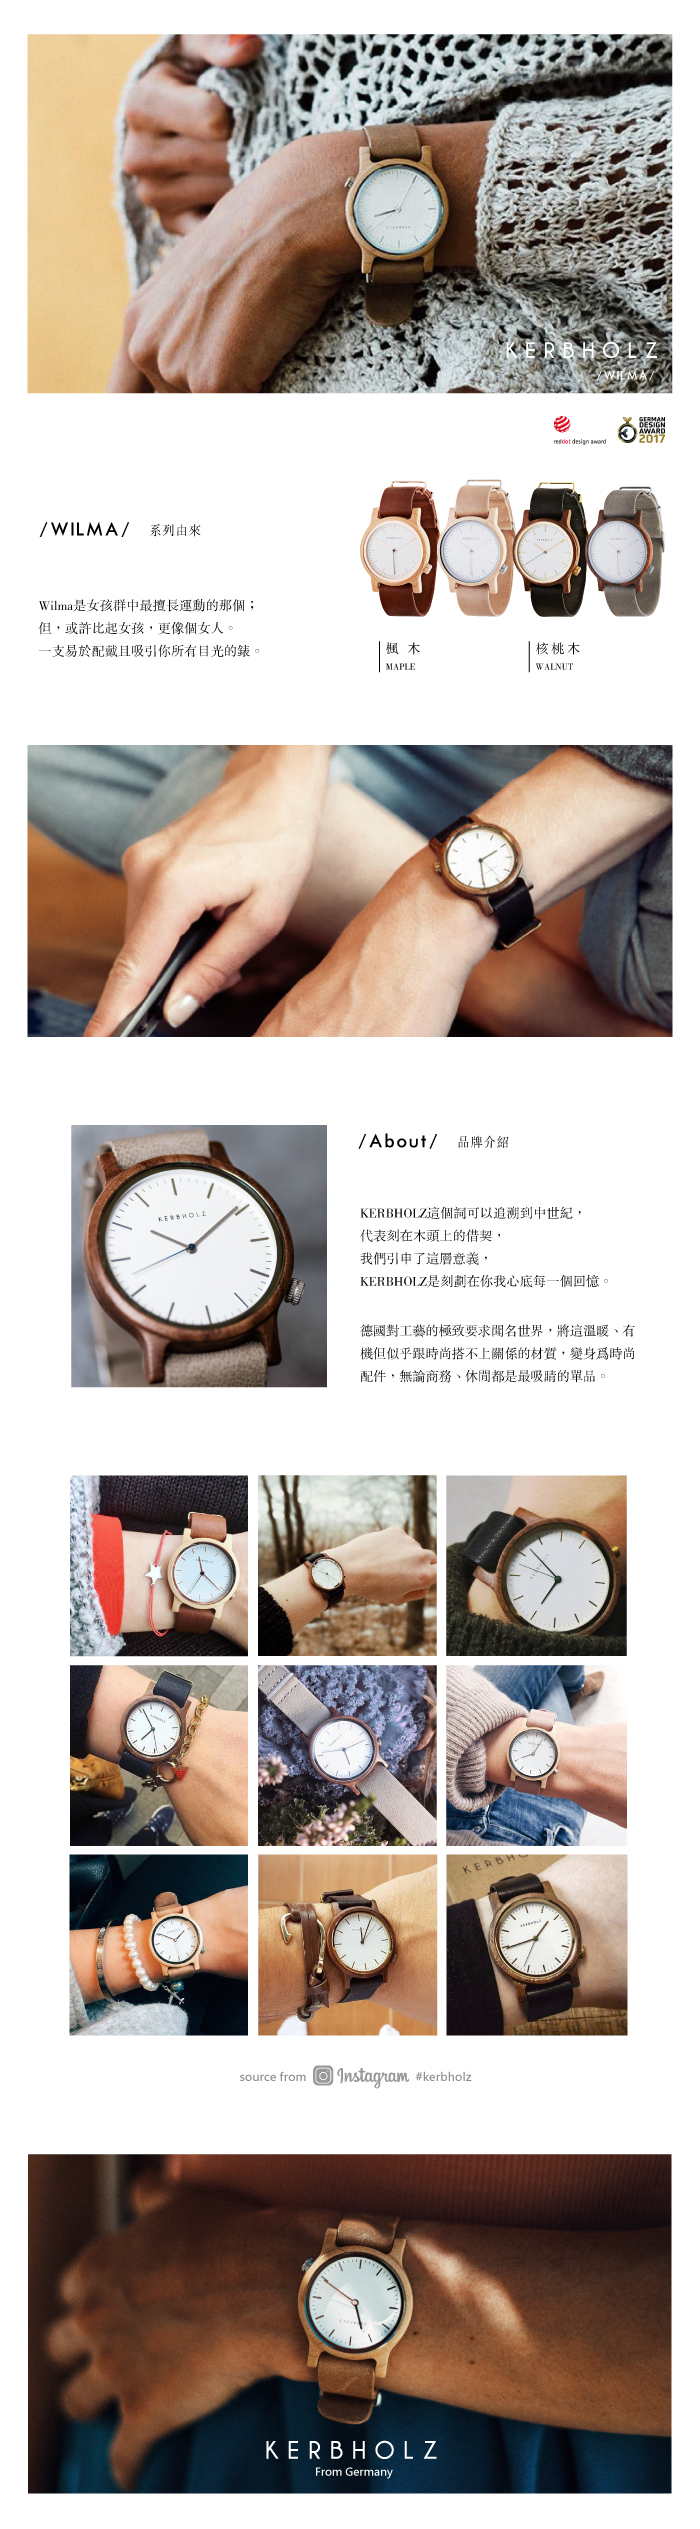 KERBHOLZ|原木手錶 Wilma - 核桃木 (真皮錶帶)